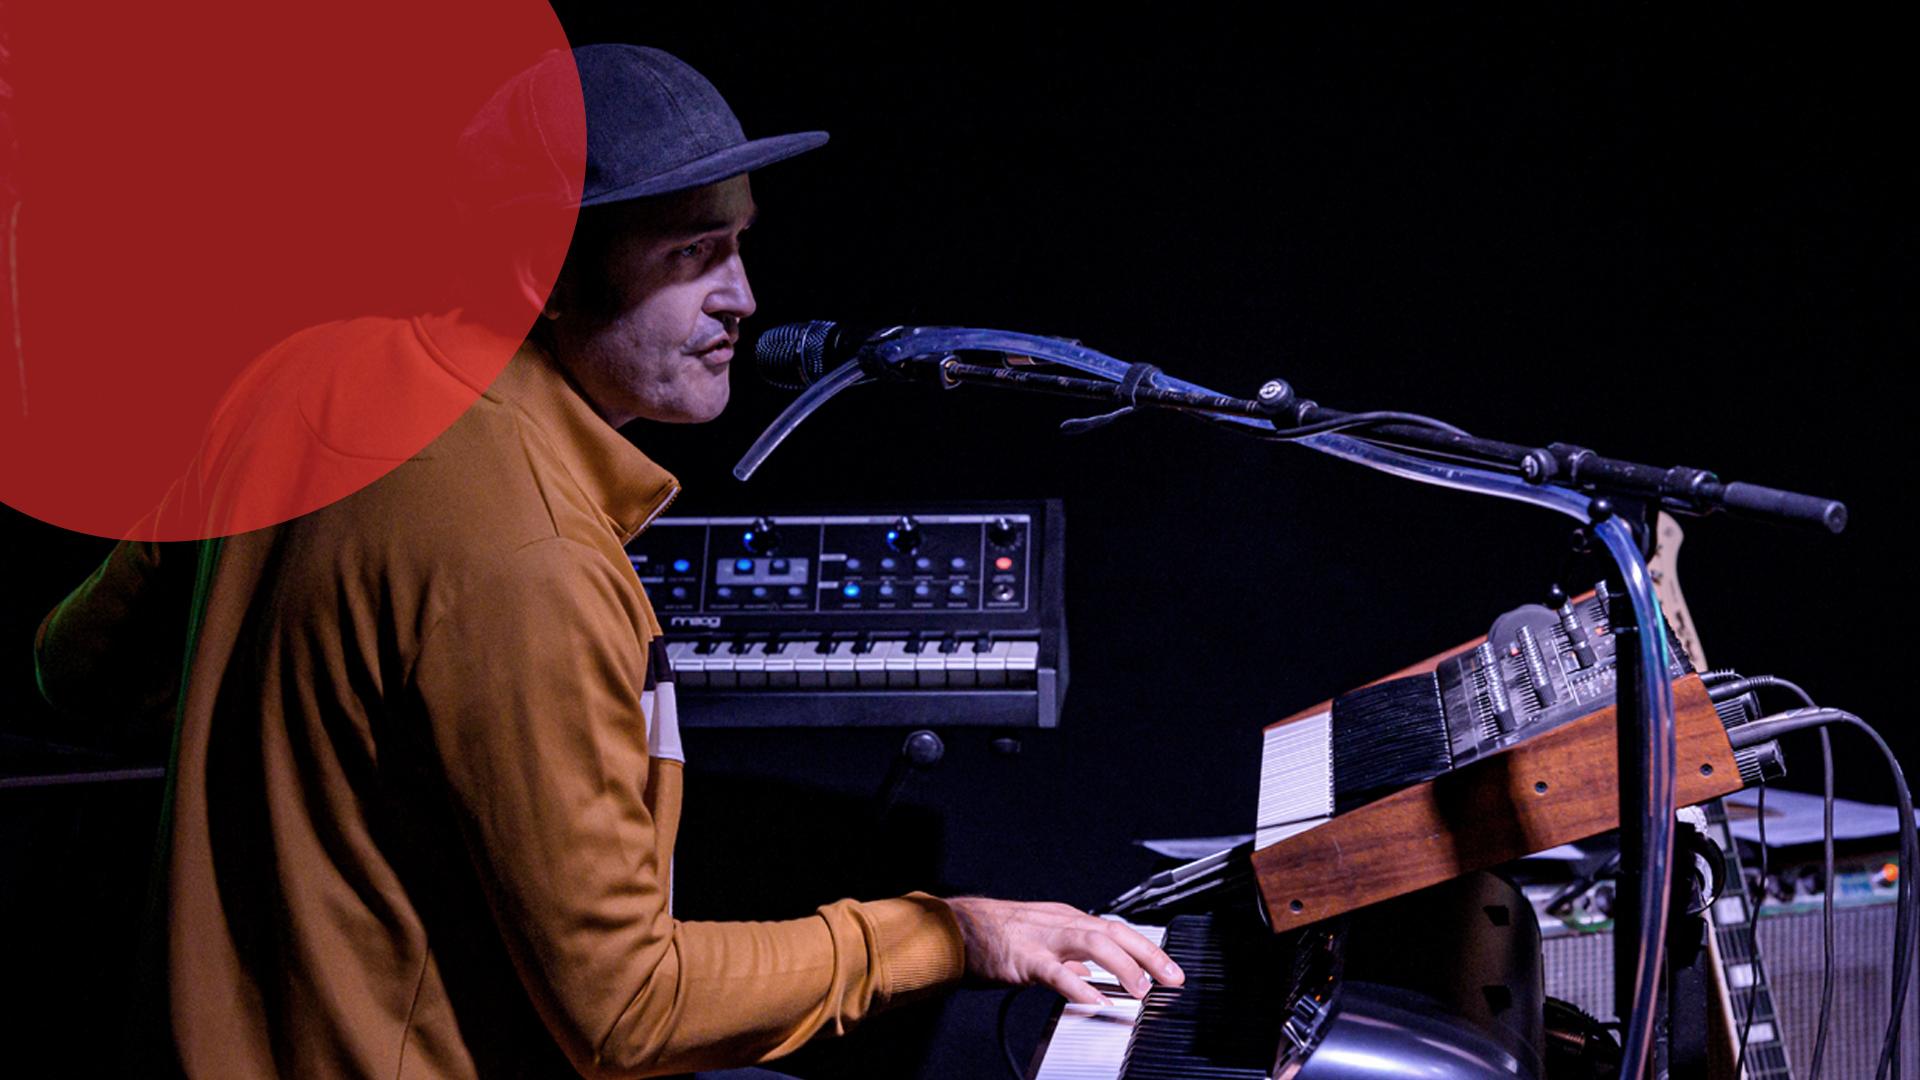 27.06.20 :: DUISBURG | Innenhafen:: YASSMO' & the soulbox